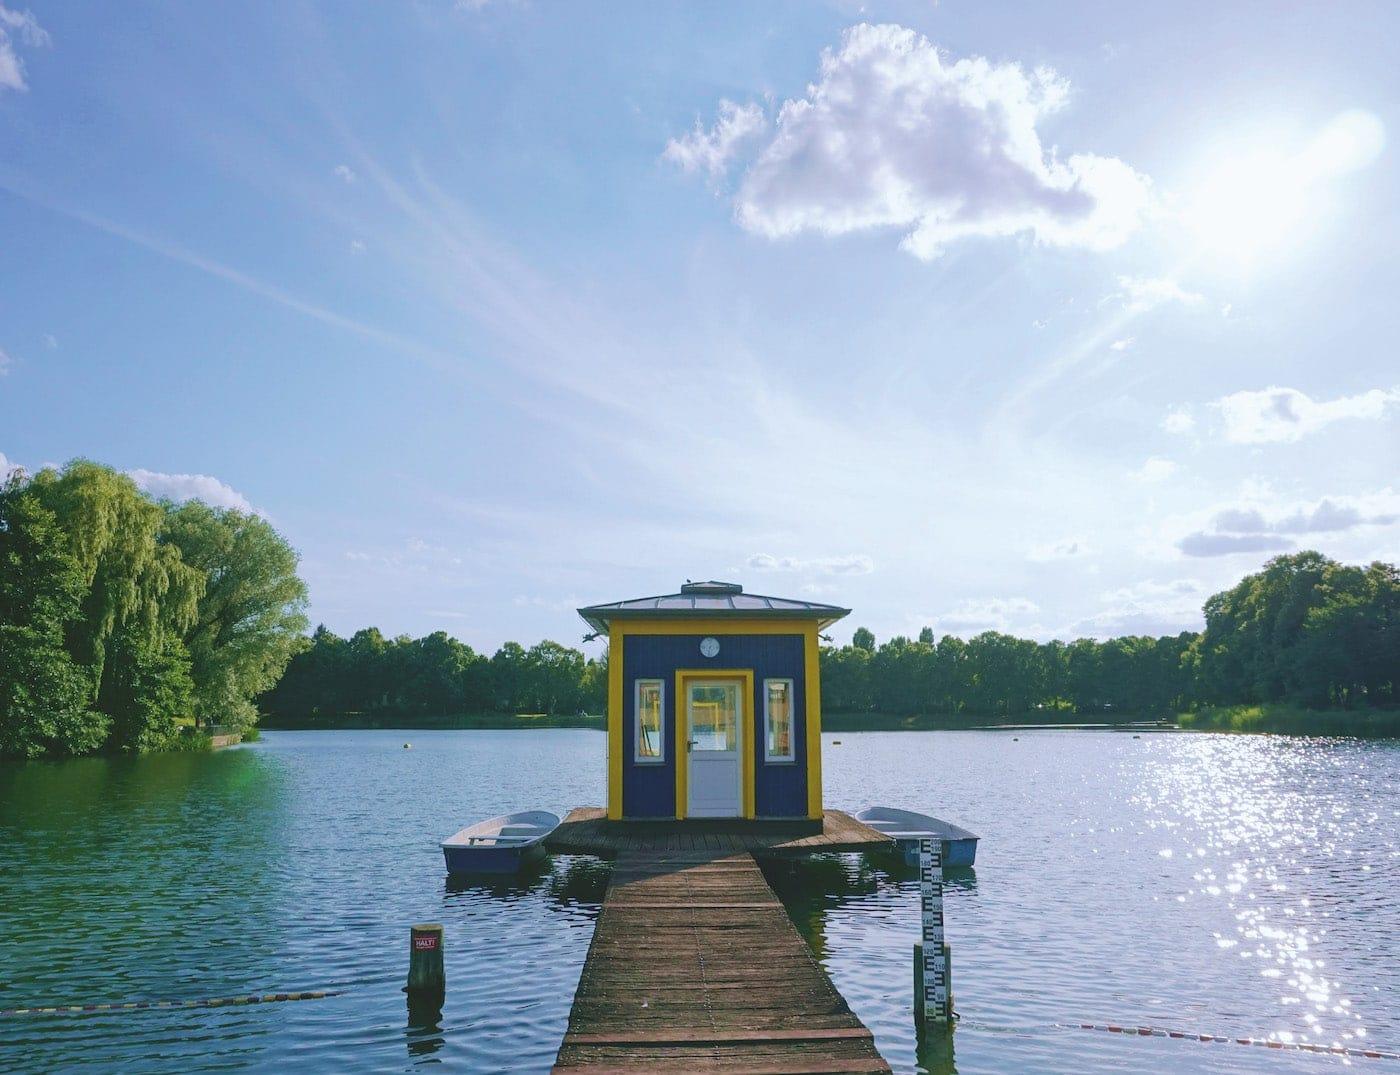 Top 10 Strandbäder: Strandbad Orankesee // HIMBEER